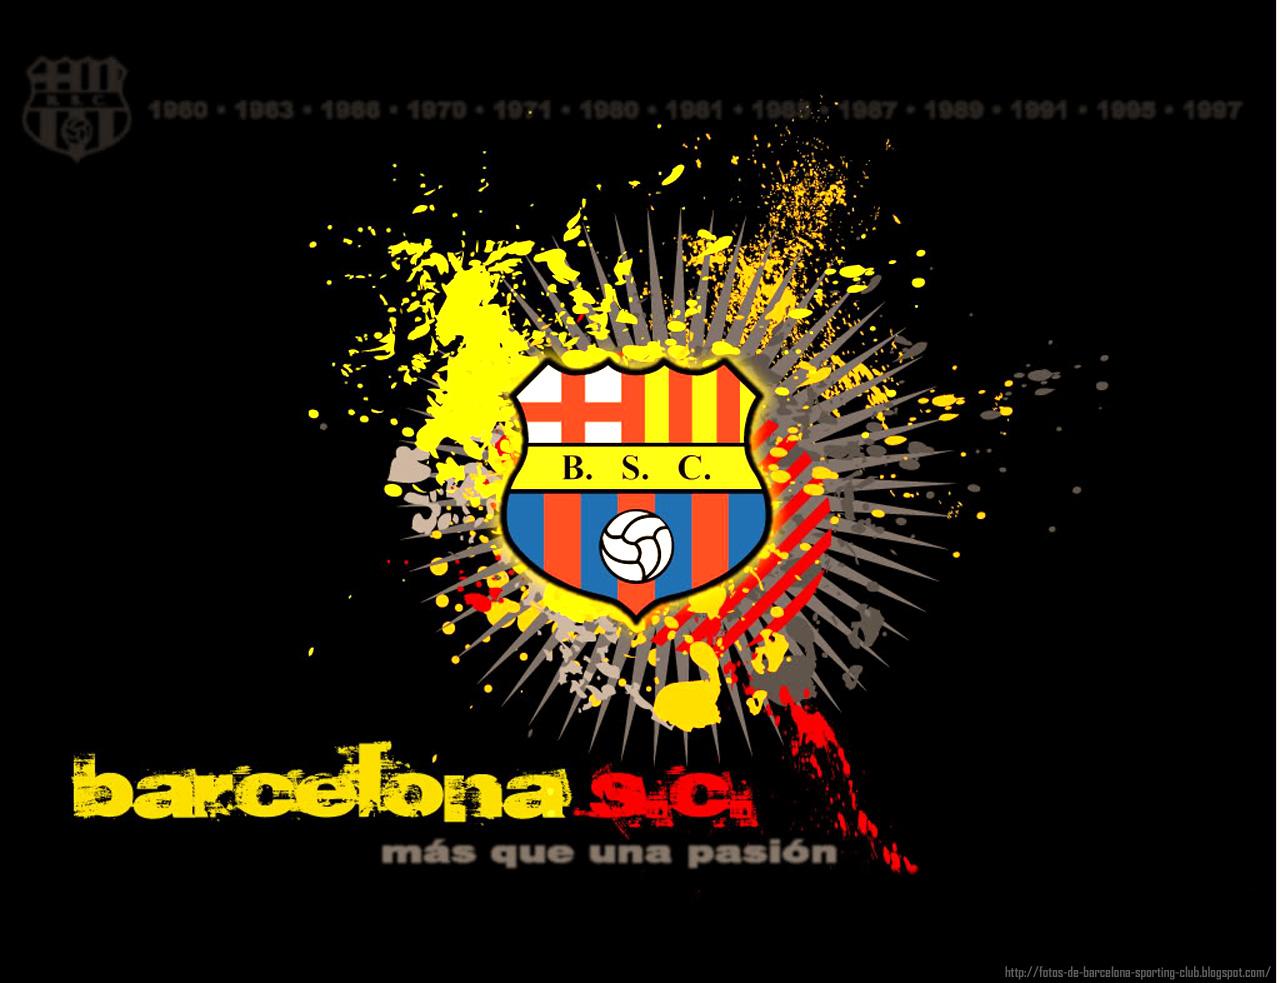 Cruz Azul Wallpaper Hd Pz C Barcelona Sc